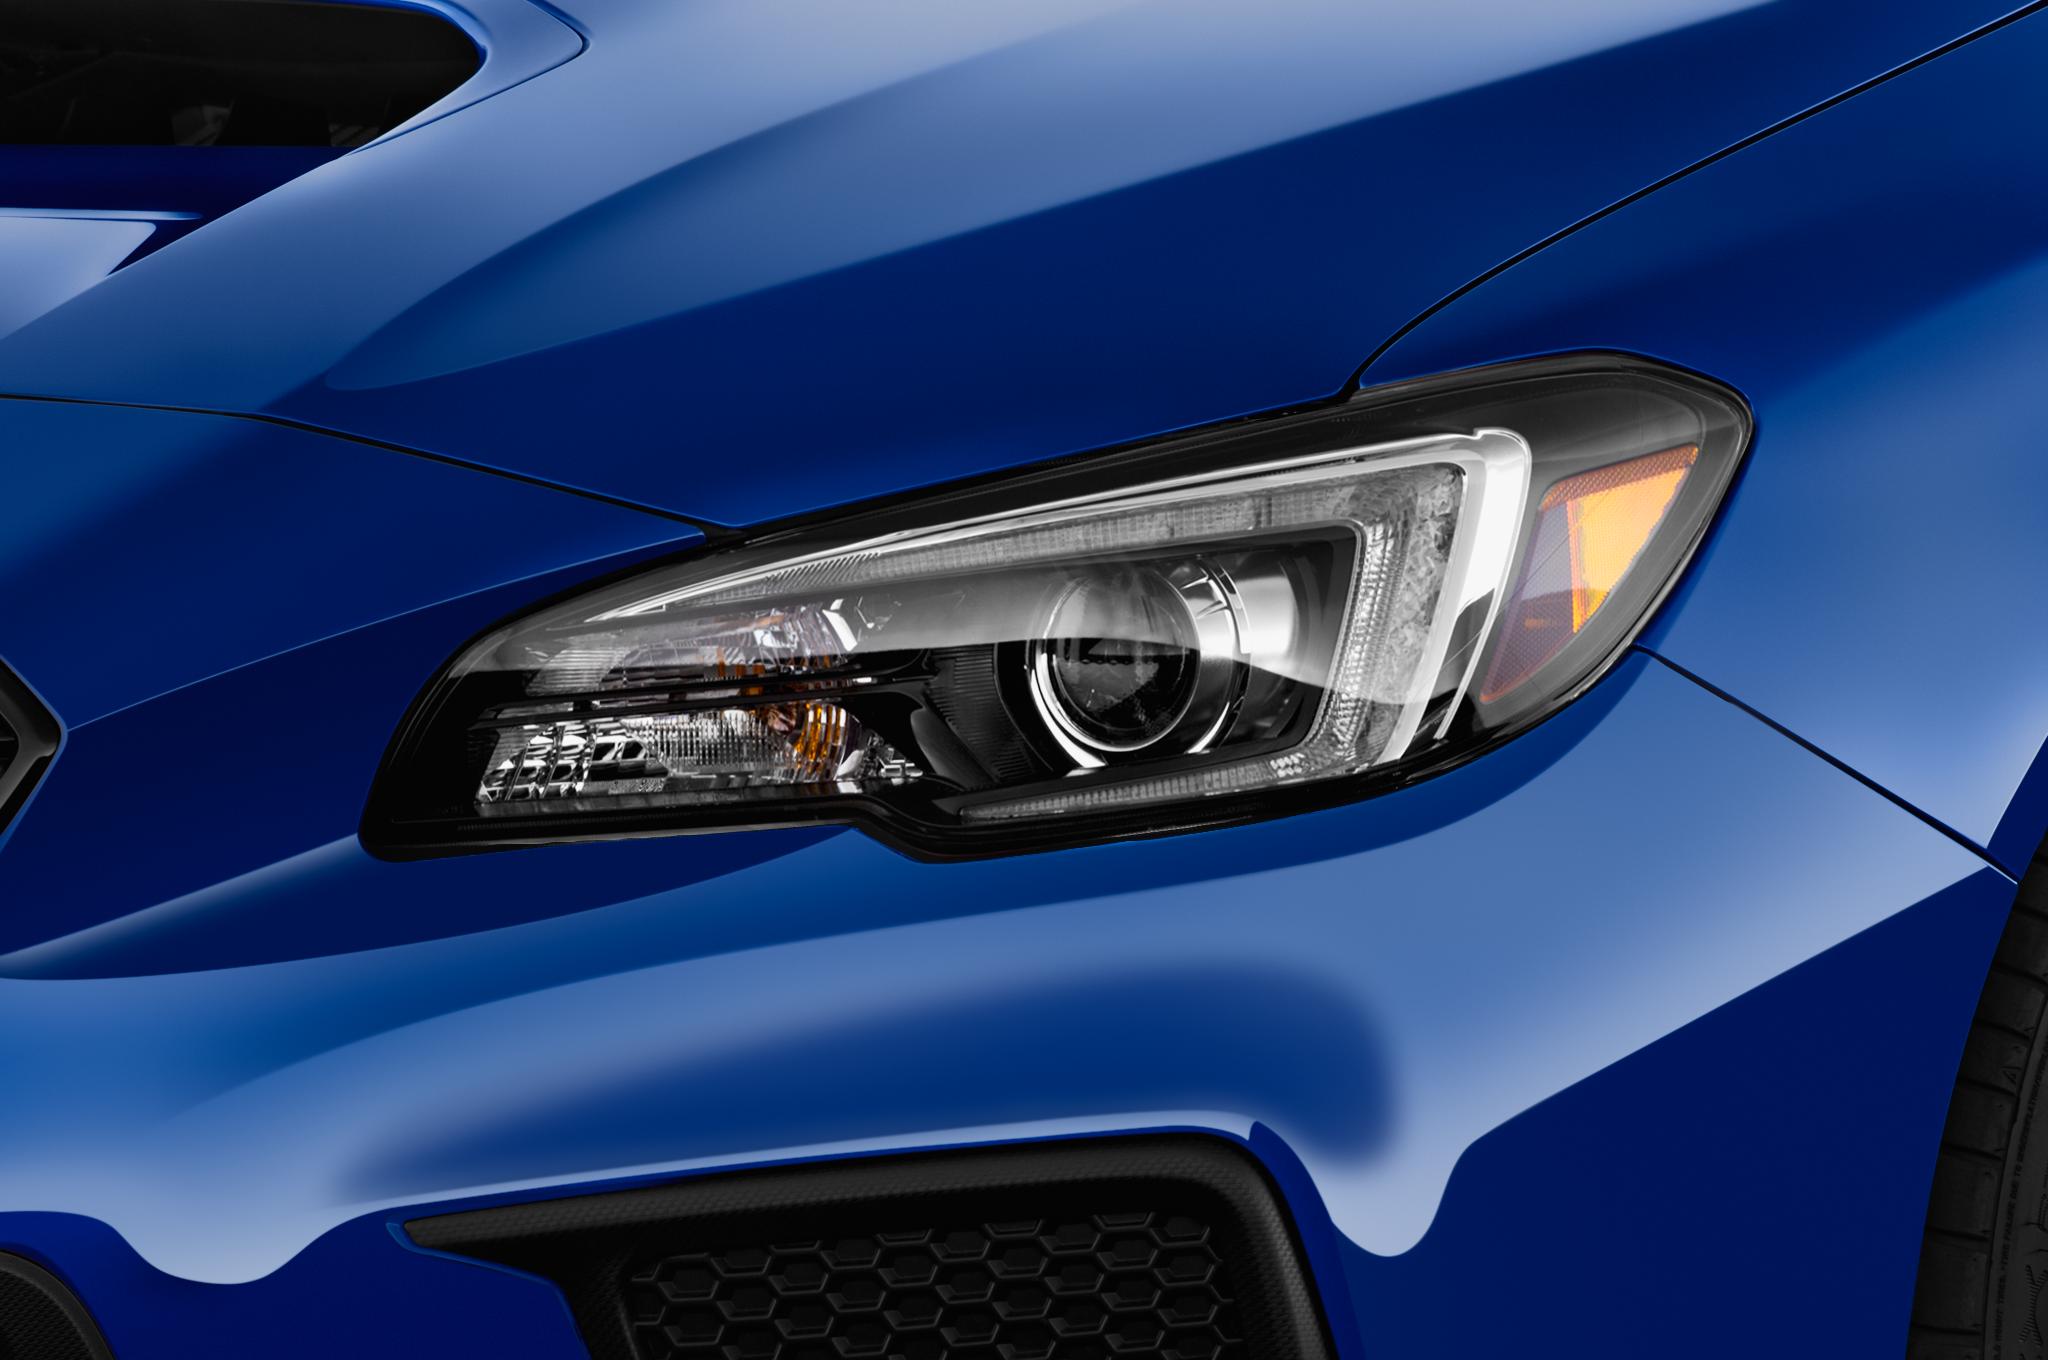 2018 Wrx 0 To 60 >> Subaru WRX STI Hybrid is Highly Likely | Automobile Magazine